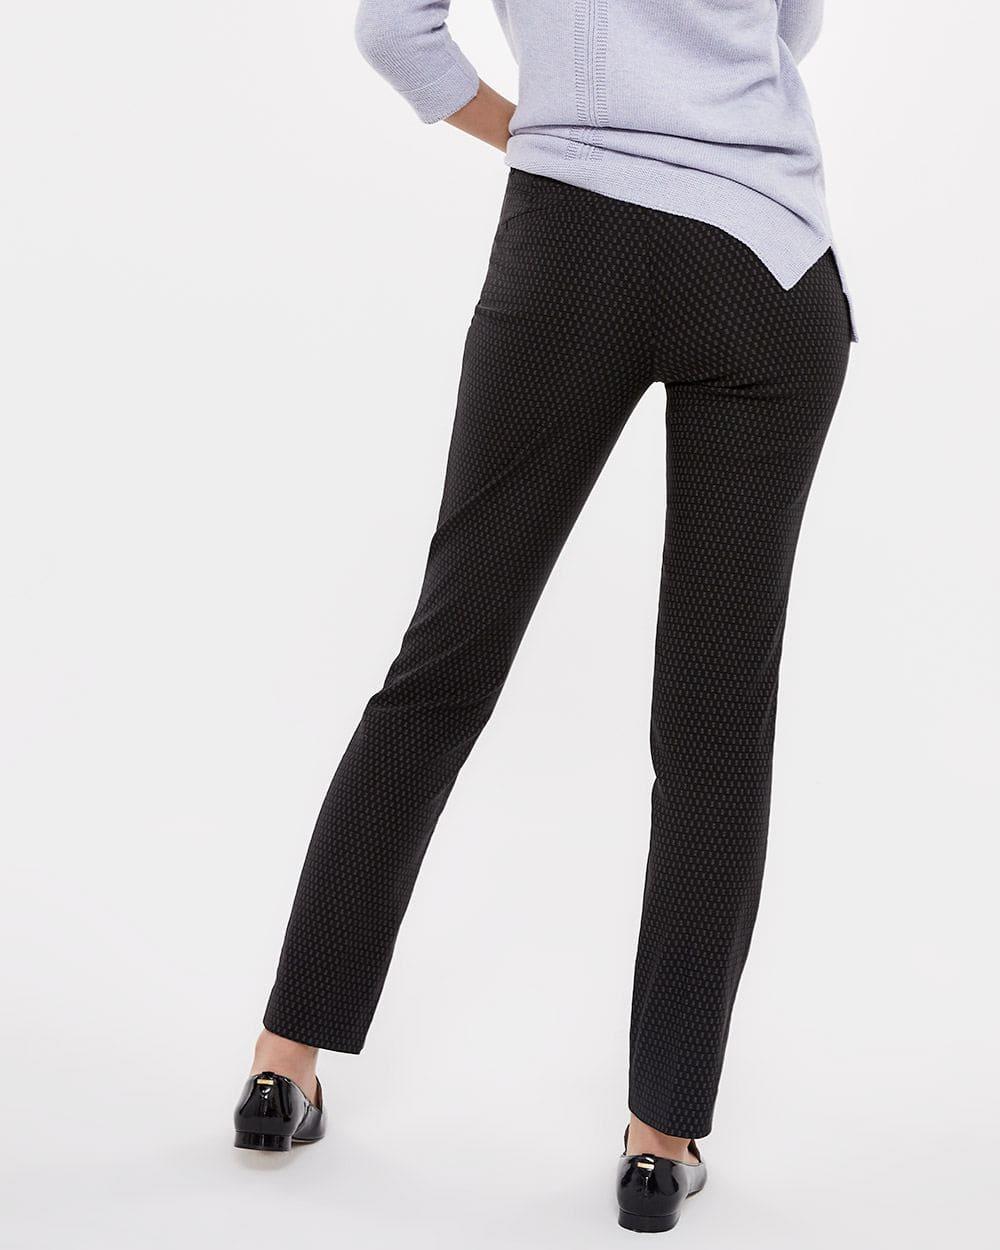 The Iconic Printed Straight Leg Pants